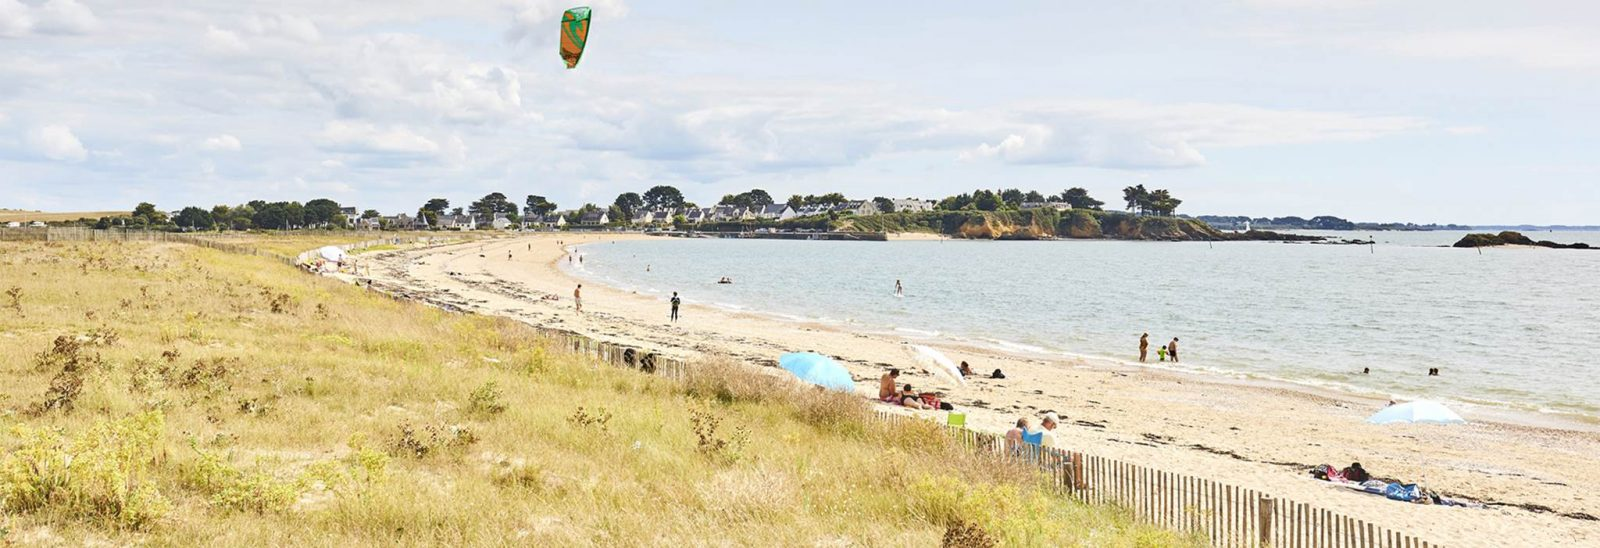 Plage de Bétahon Ambon Morbihan